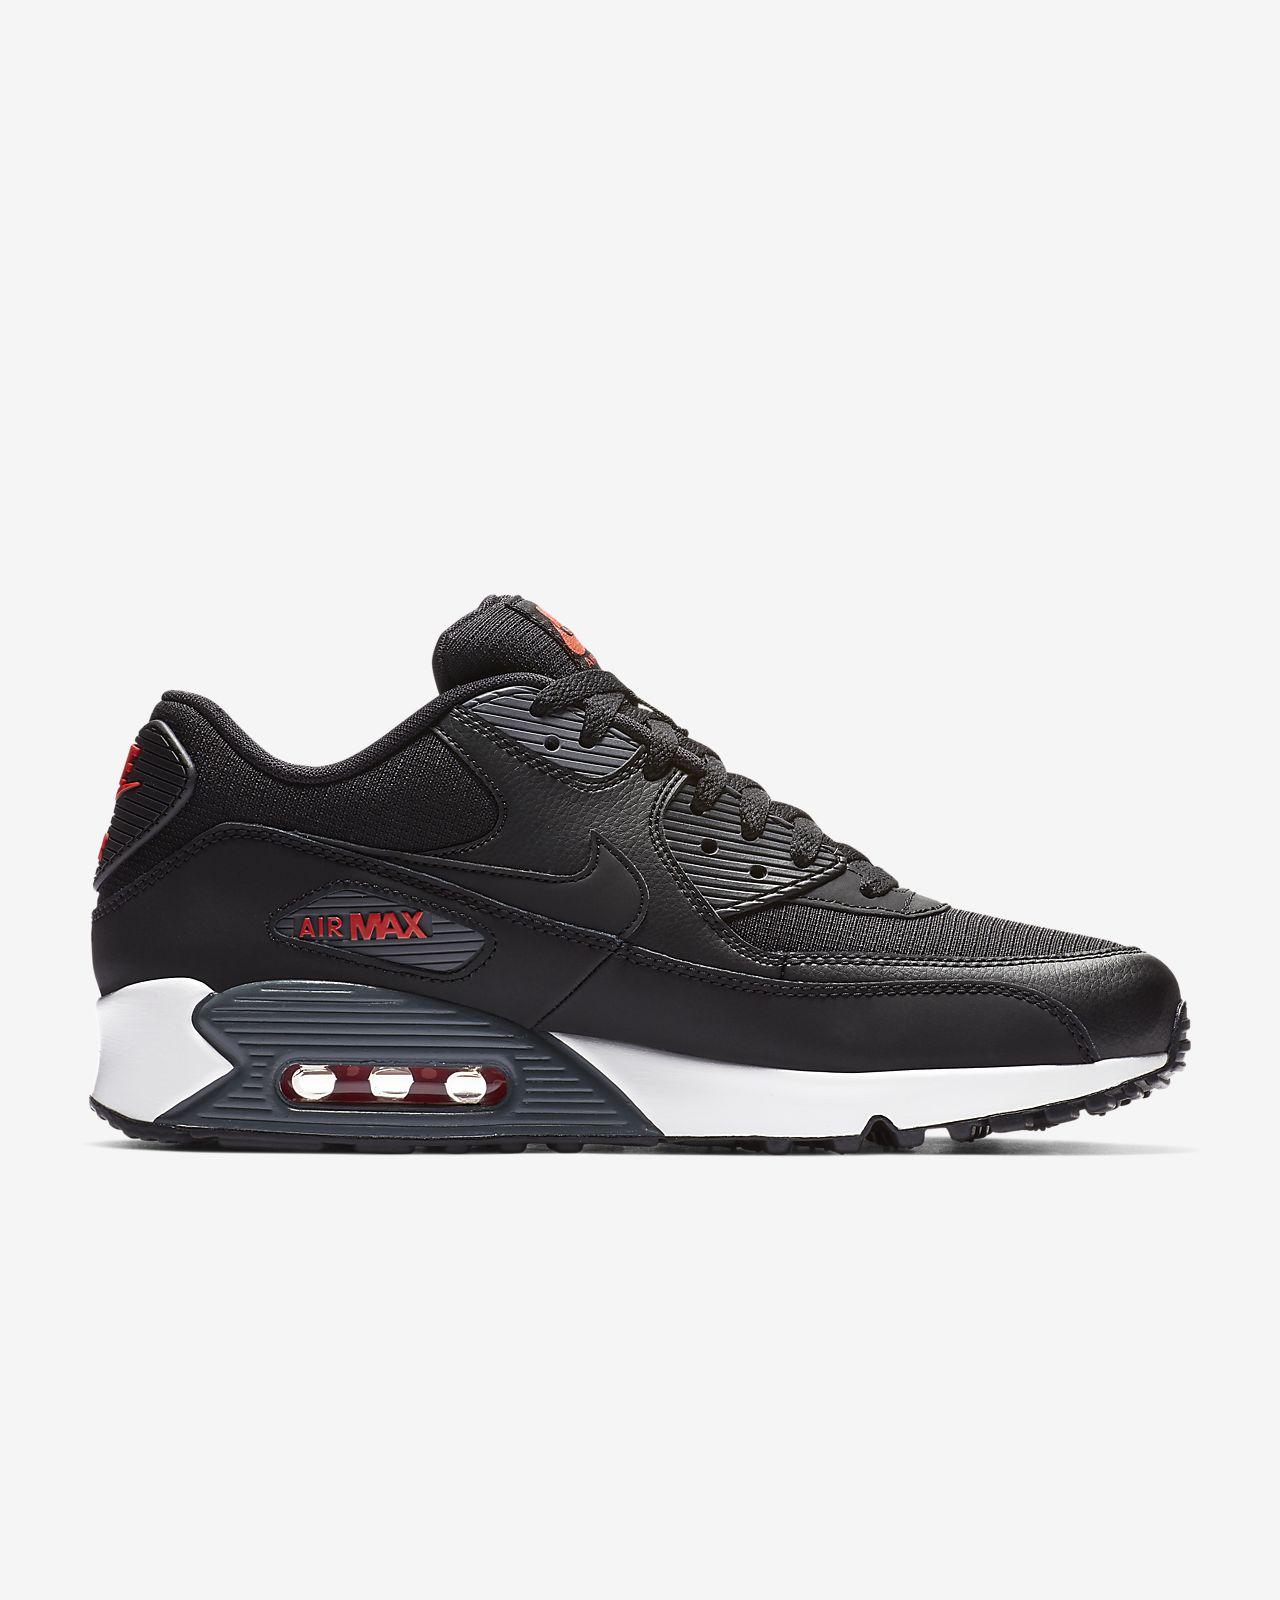 super popular ce21f c0784 ... Nike Air Max 90 SE sko til herre